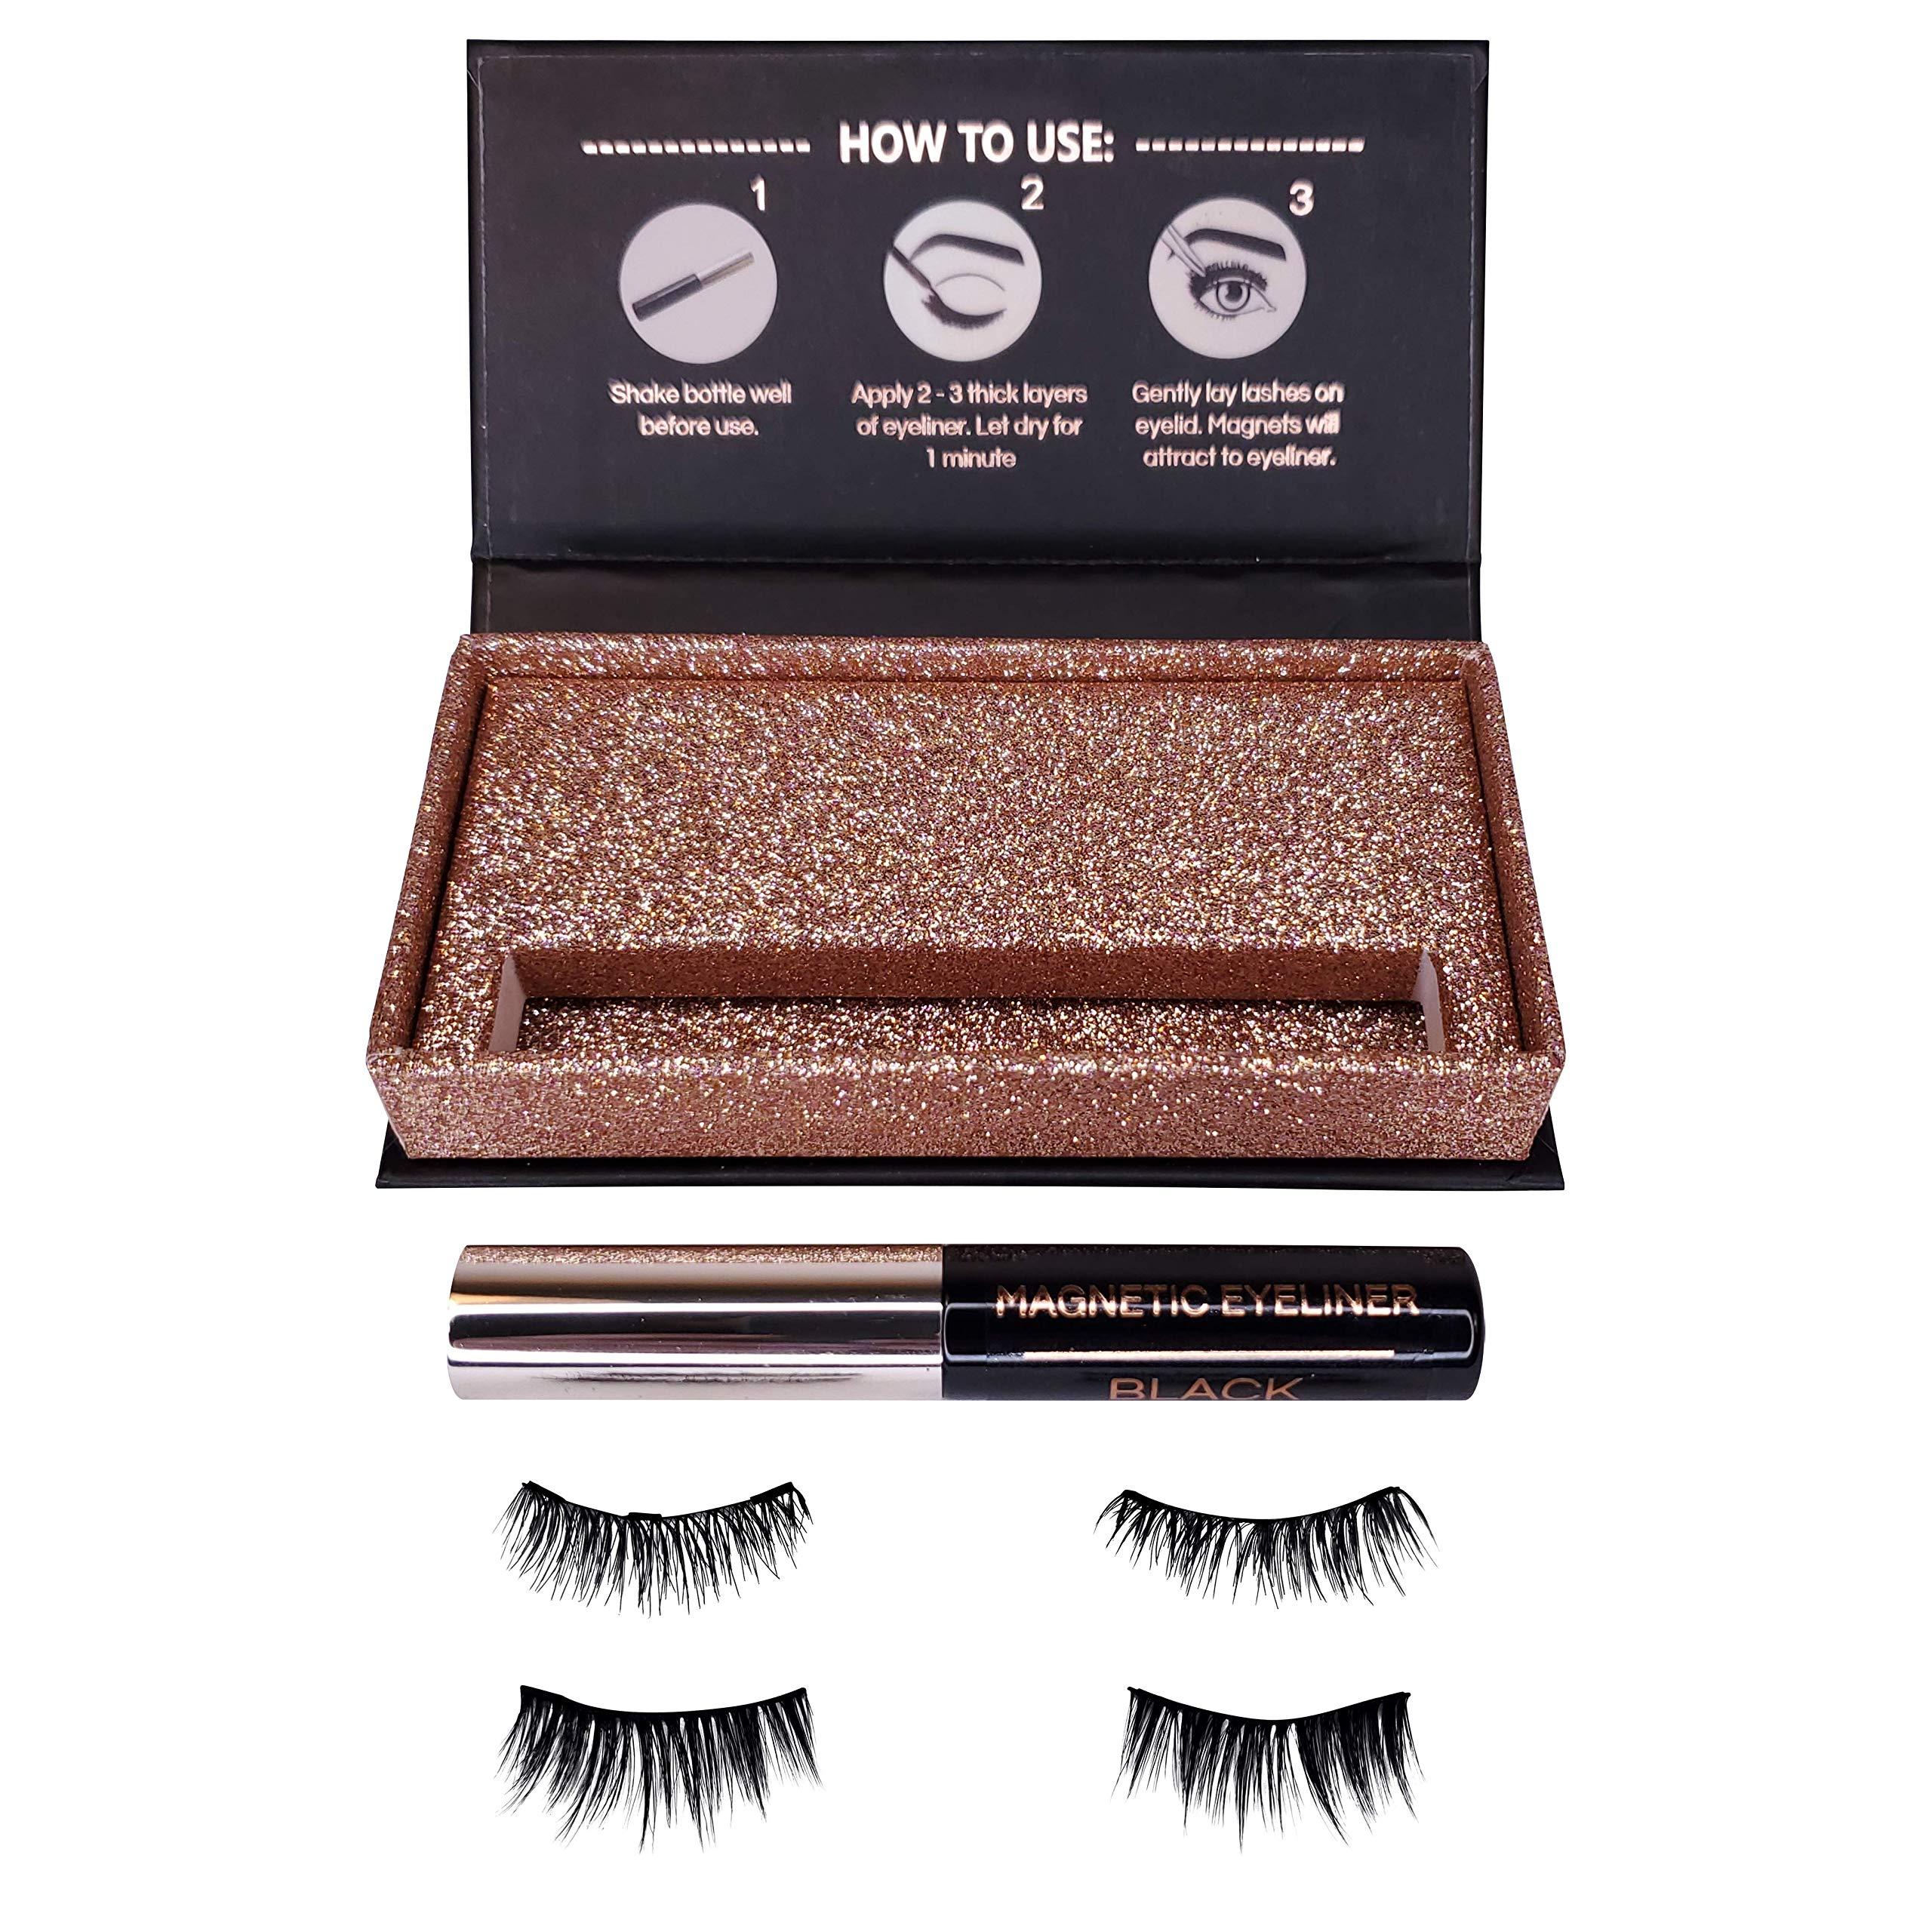 Day to Night Magnetic Eyeliner and Eyelash Kit - Reusable Silk False Lashes - Natural Look [No Glue] - By Clevermore Essentials by Clevermore Essentials, LLC. (Image #3)